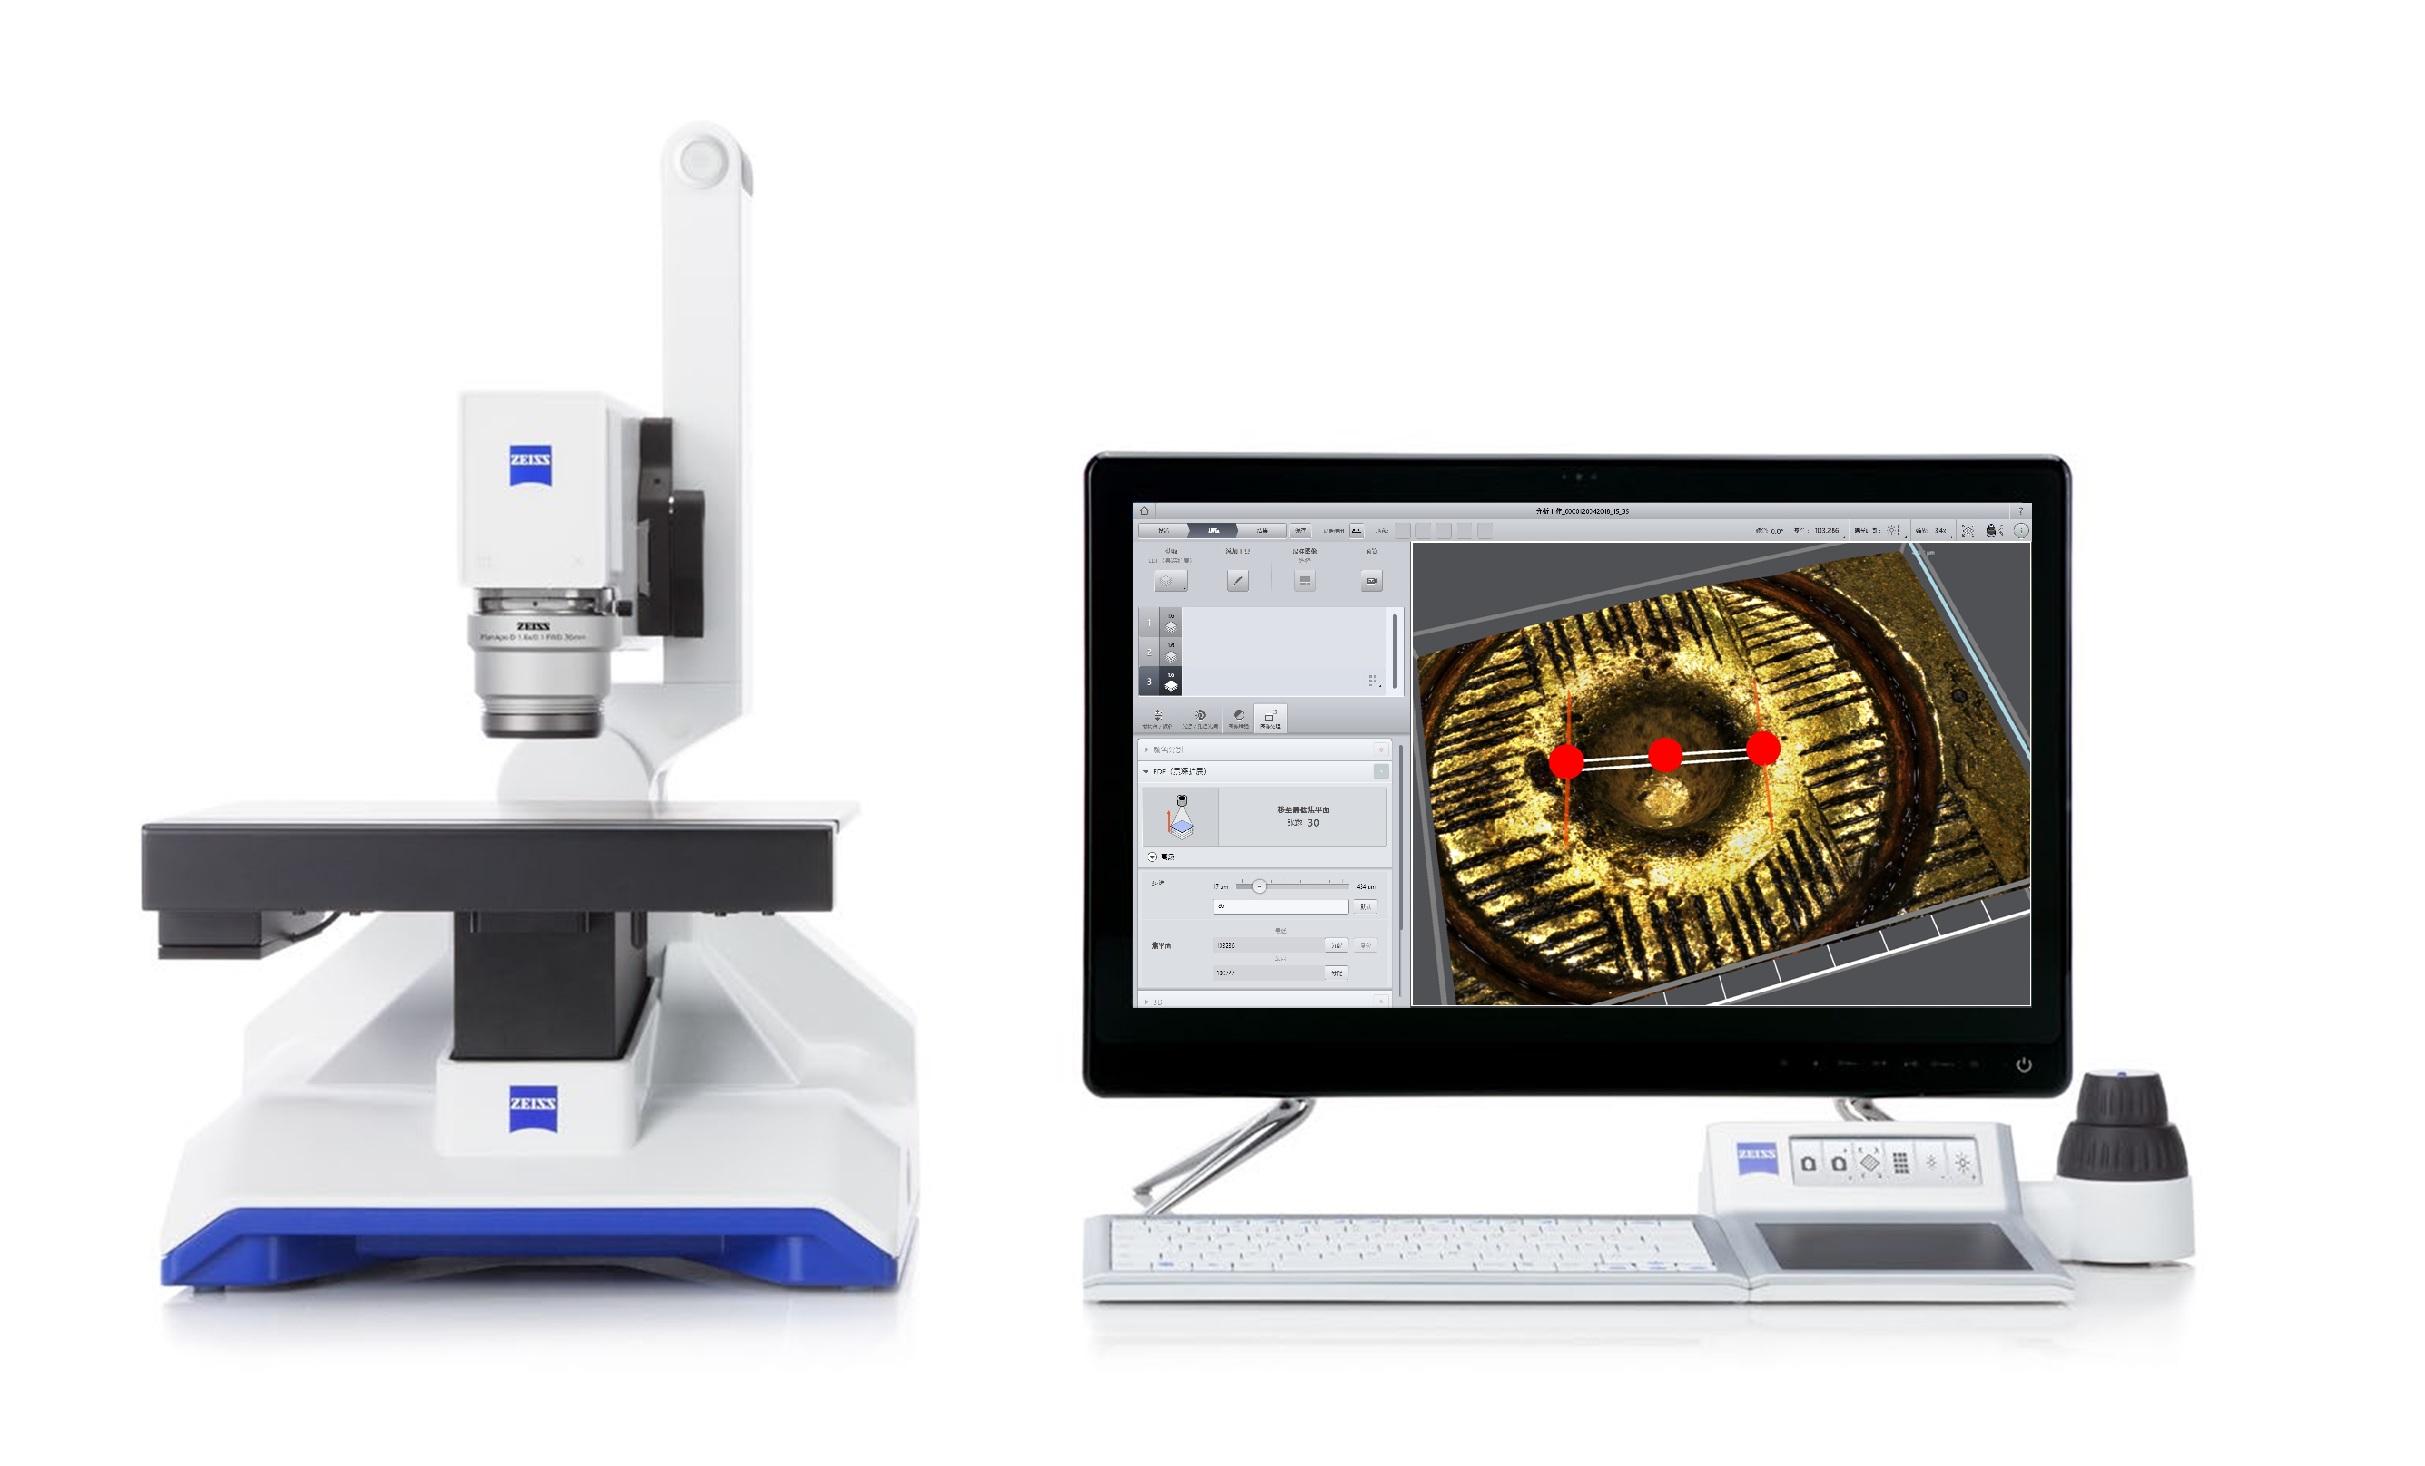 Smart zoom 5 智能化超景深顯微鏡